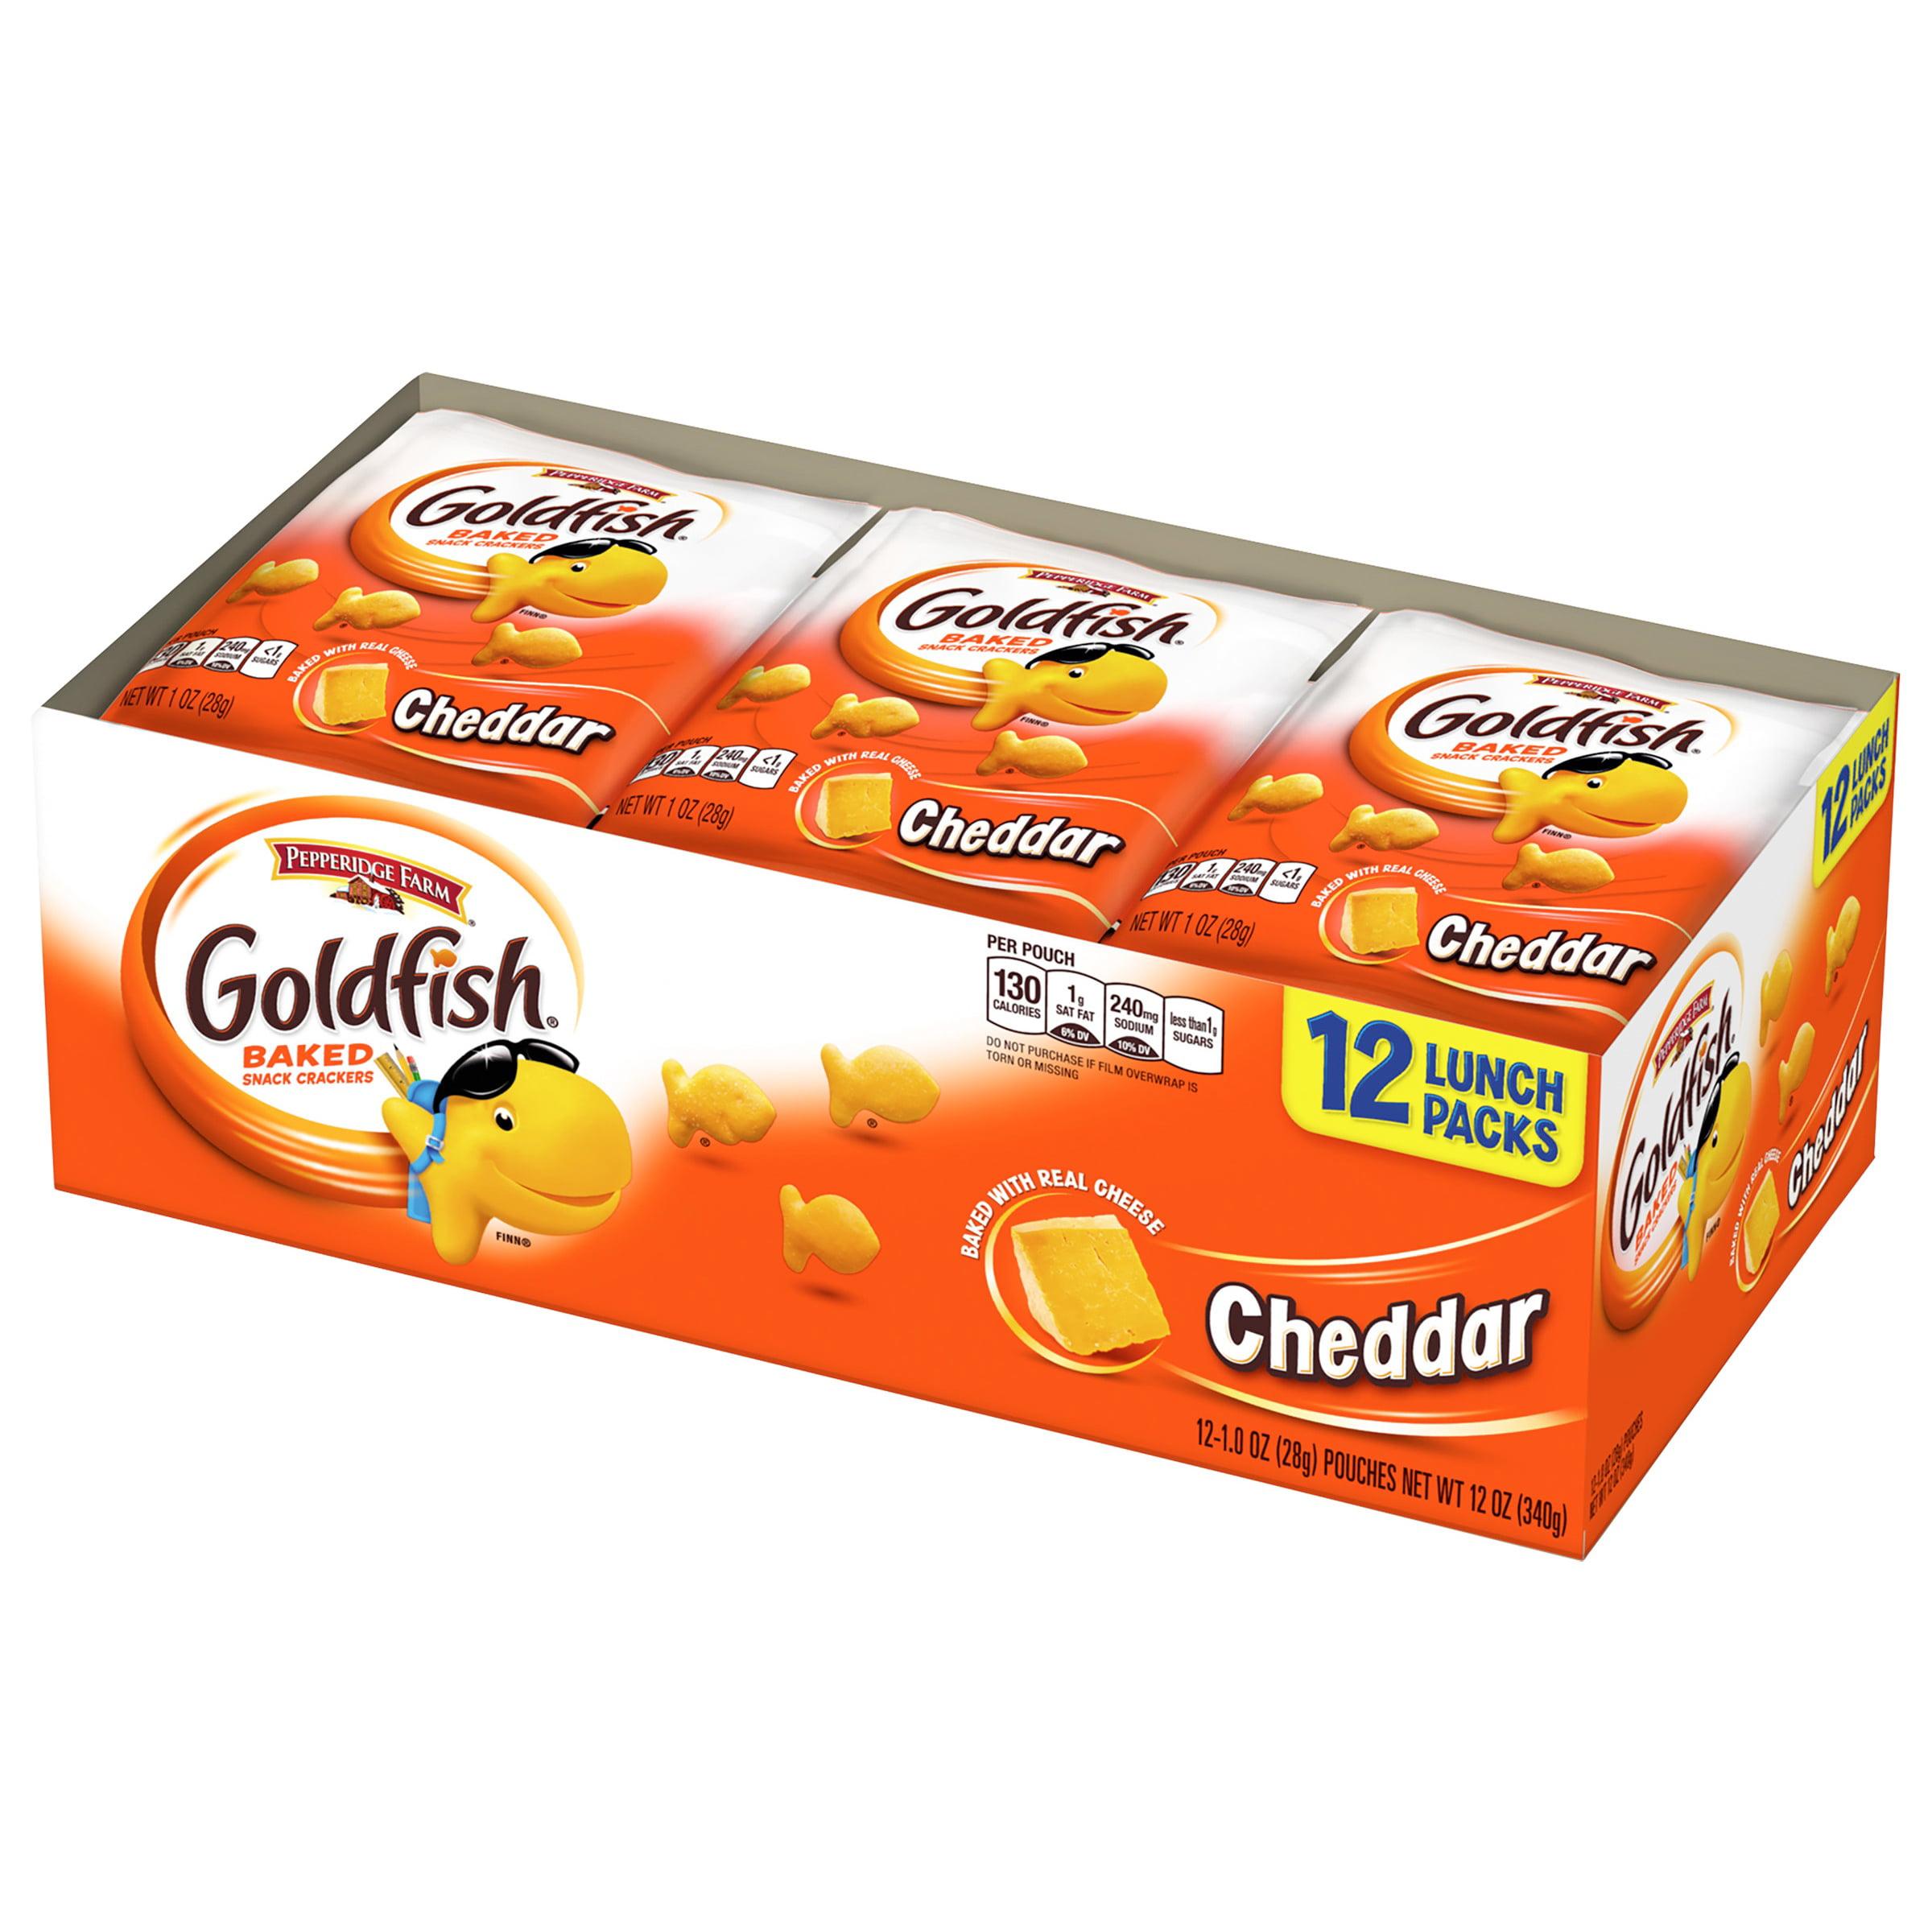 Pepperidge Farm® Goldfish® Cheddar Baked Snack Crackers 12-1 oz. Pouches